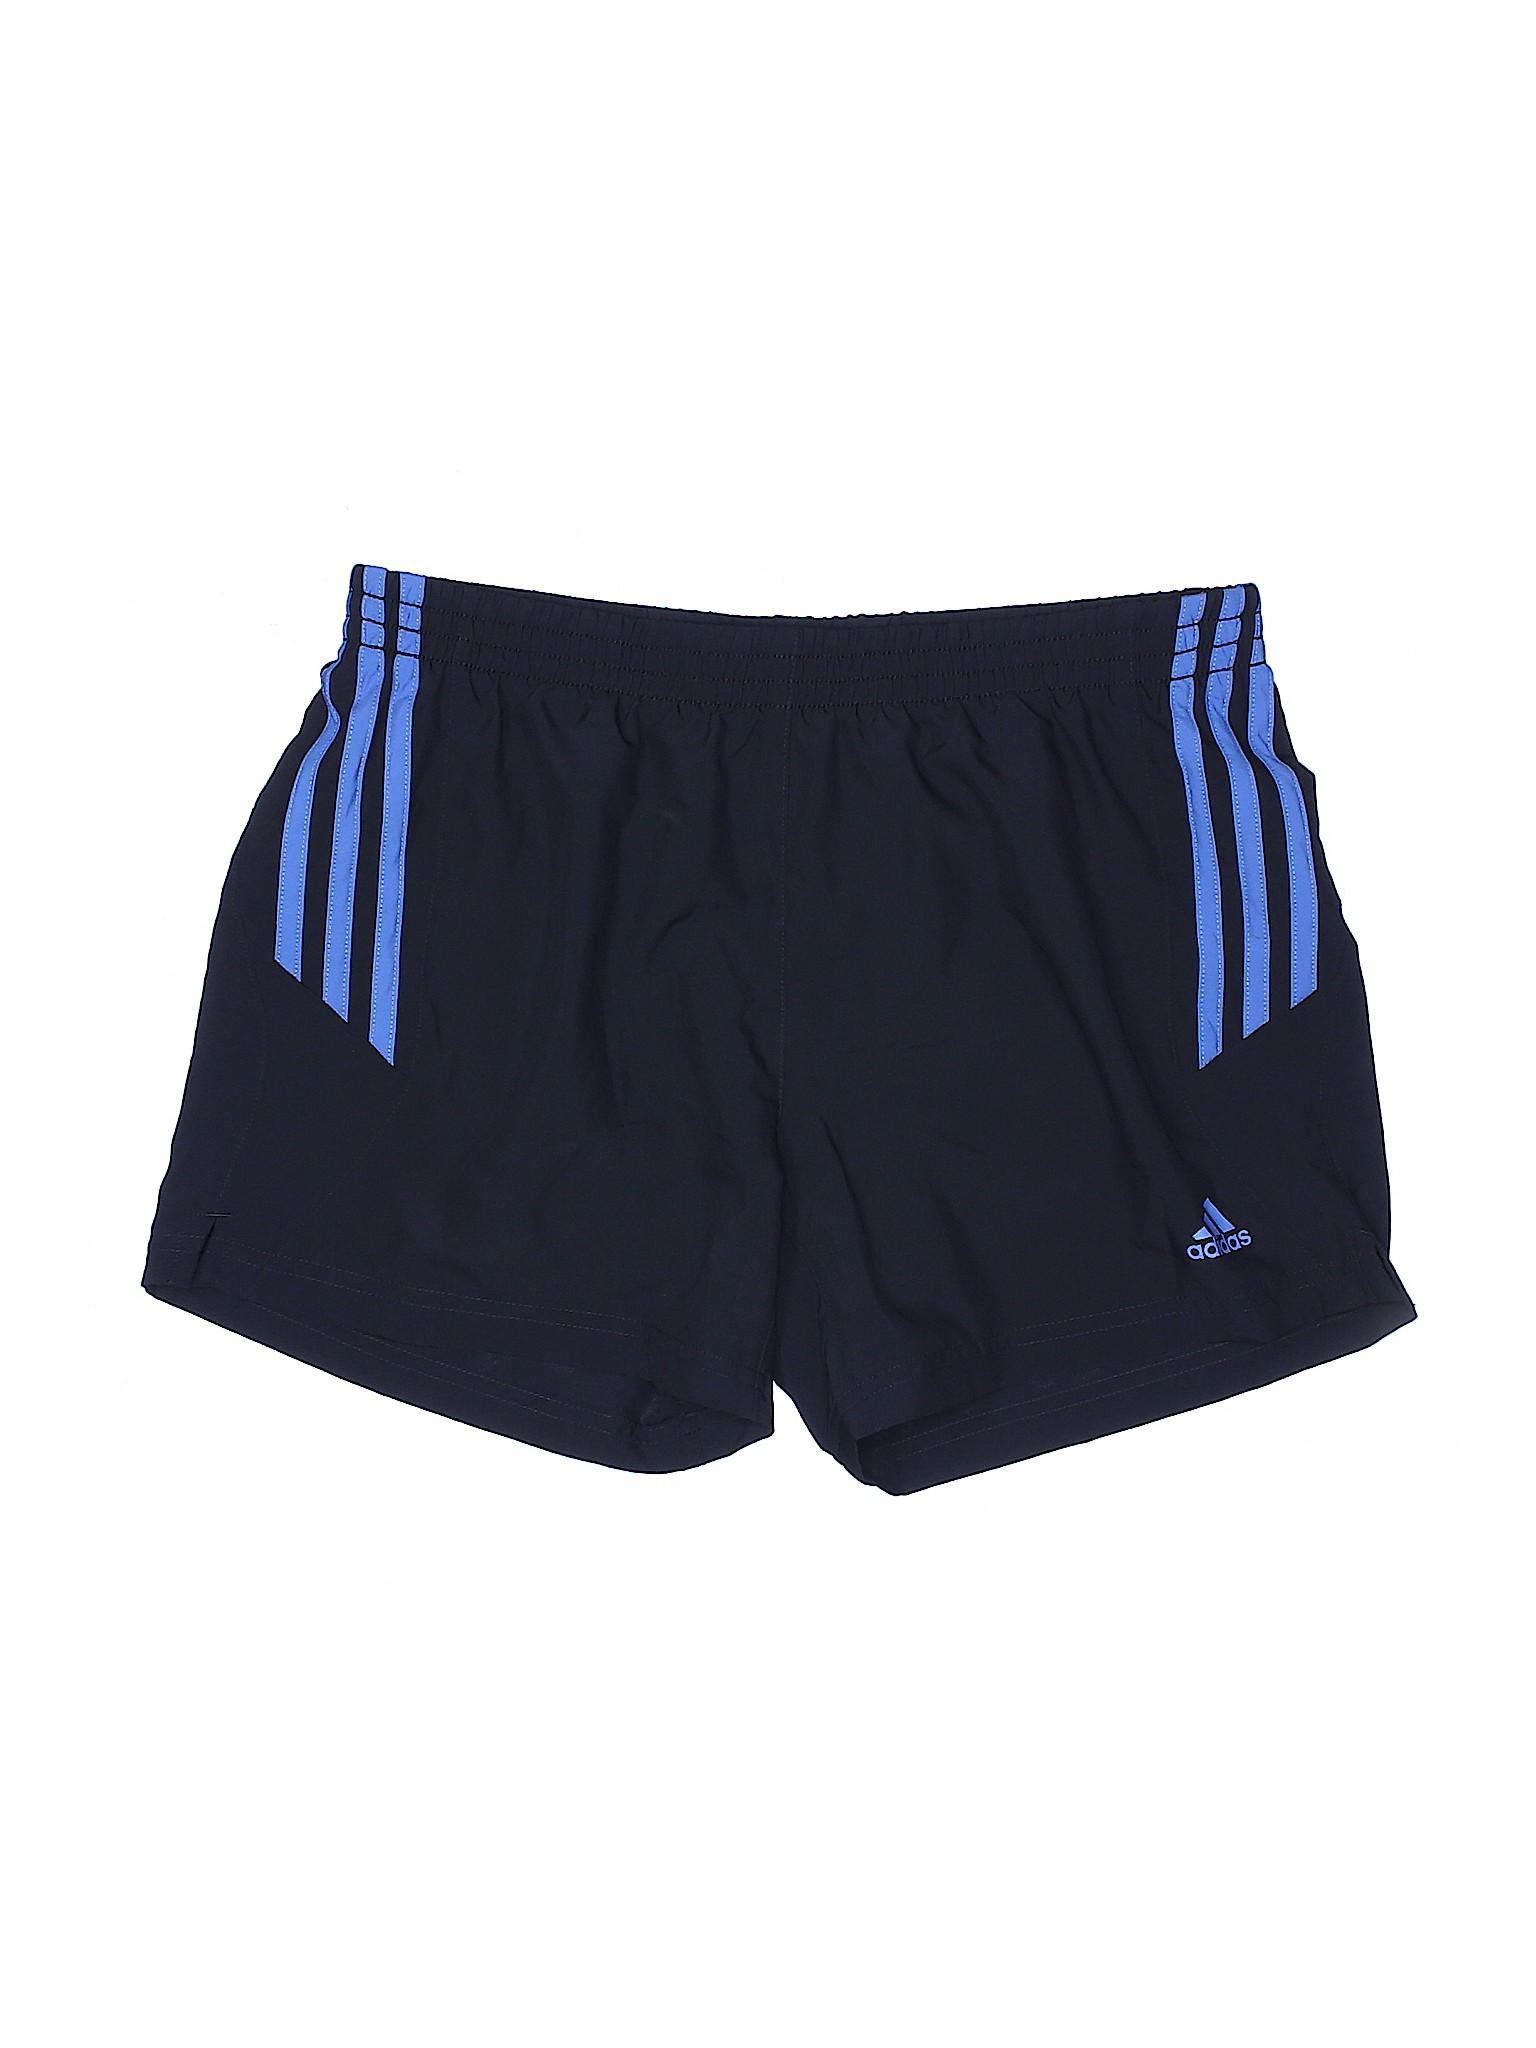 Boutique leisure Boutique Athletic Adidas leisure Shorts Adidas vdFfvq